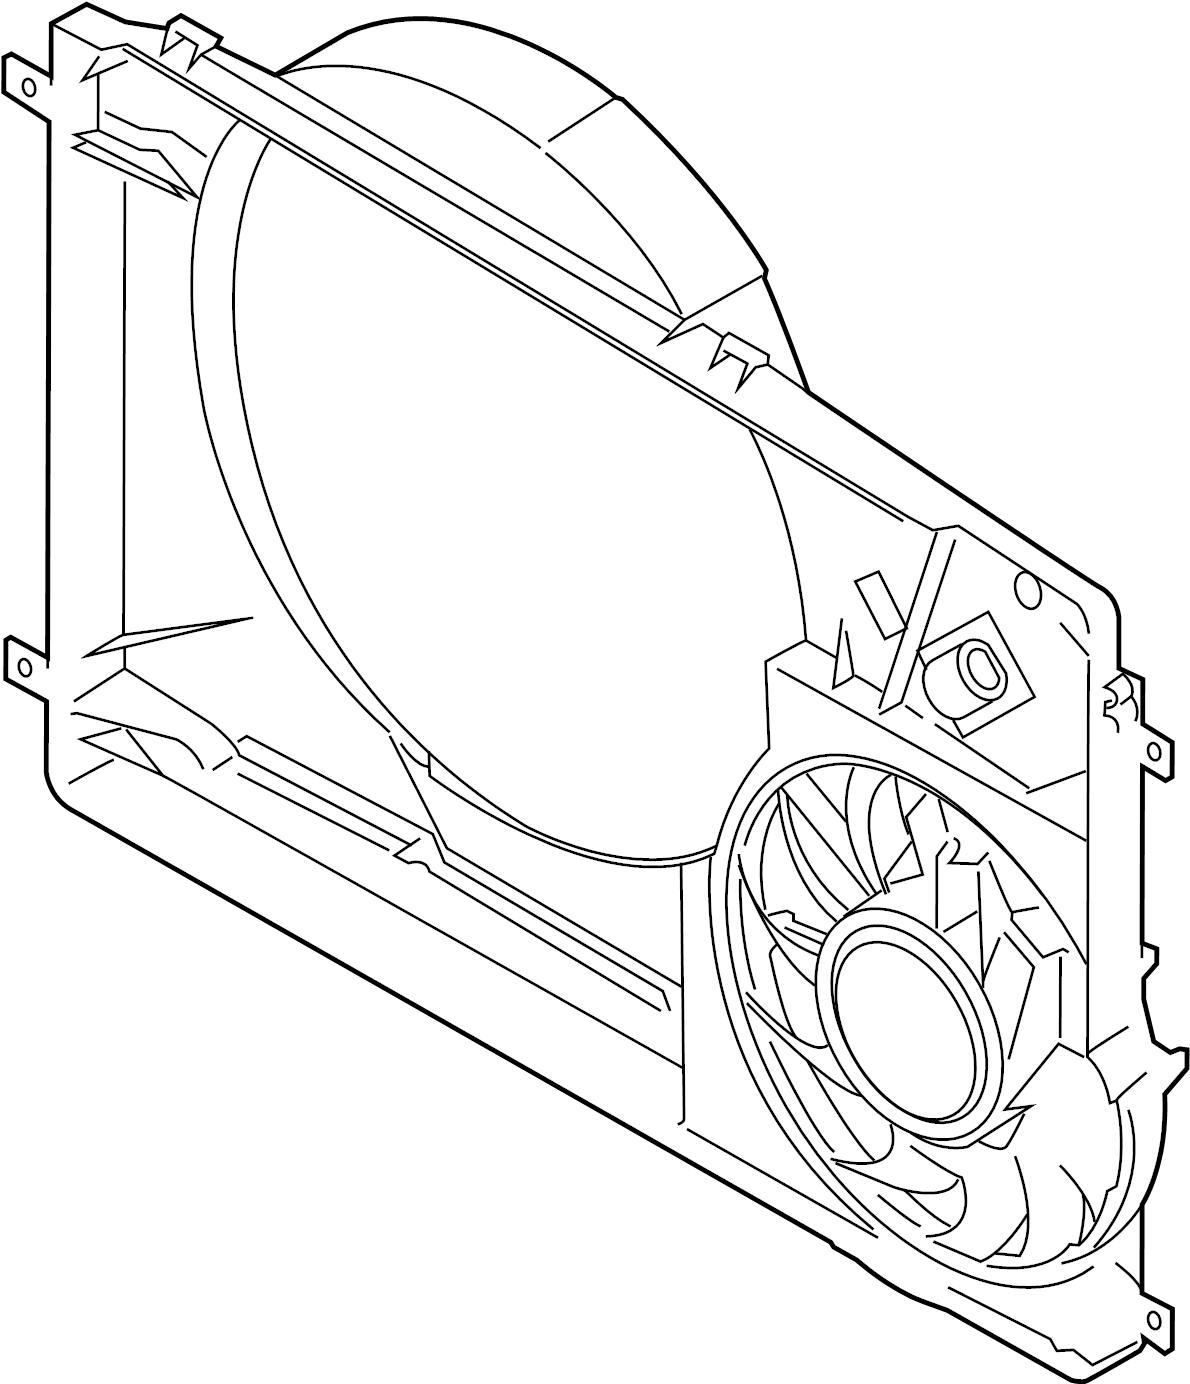 Ford Transit 150 Engine Cooling Fan Assembly 3 2 Liter